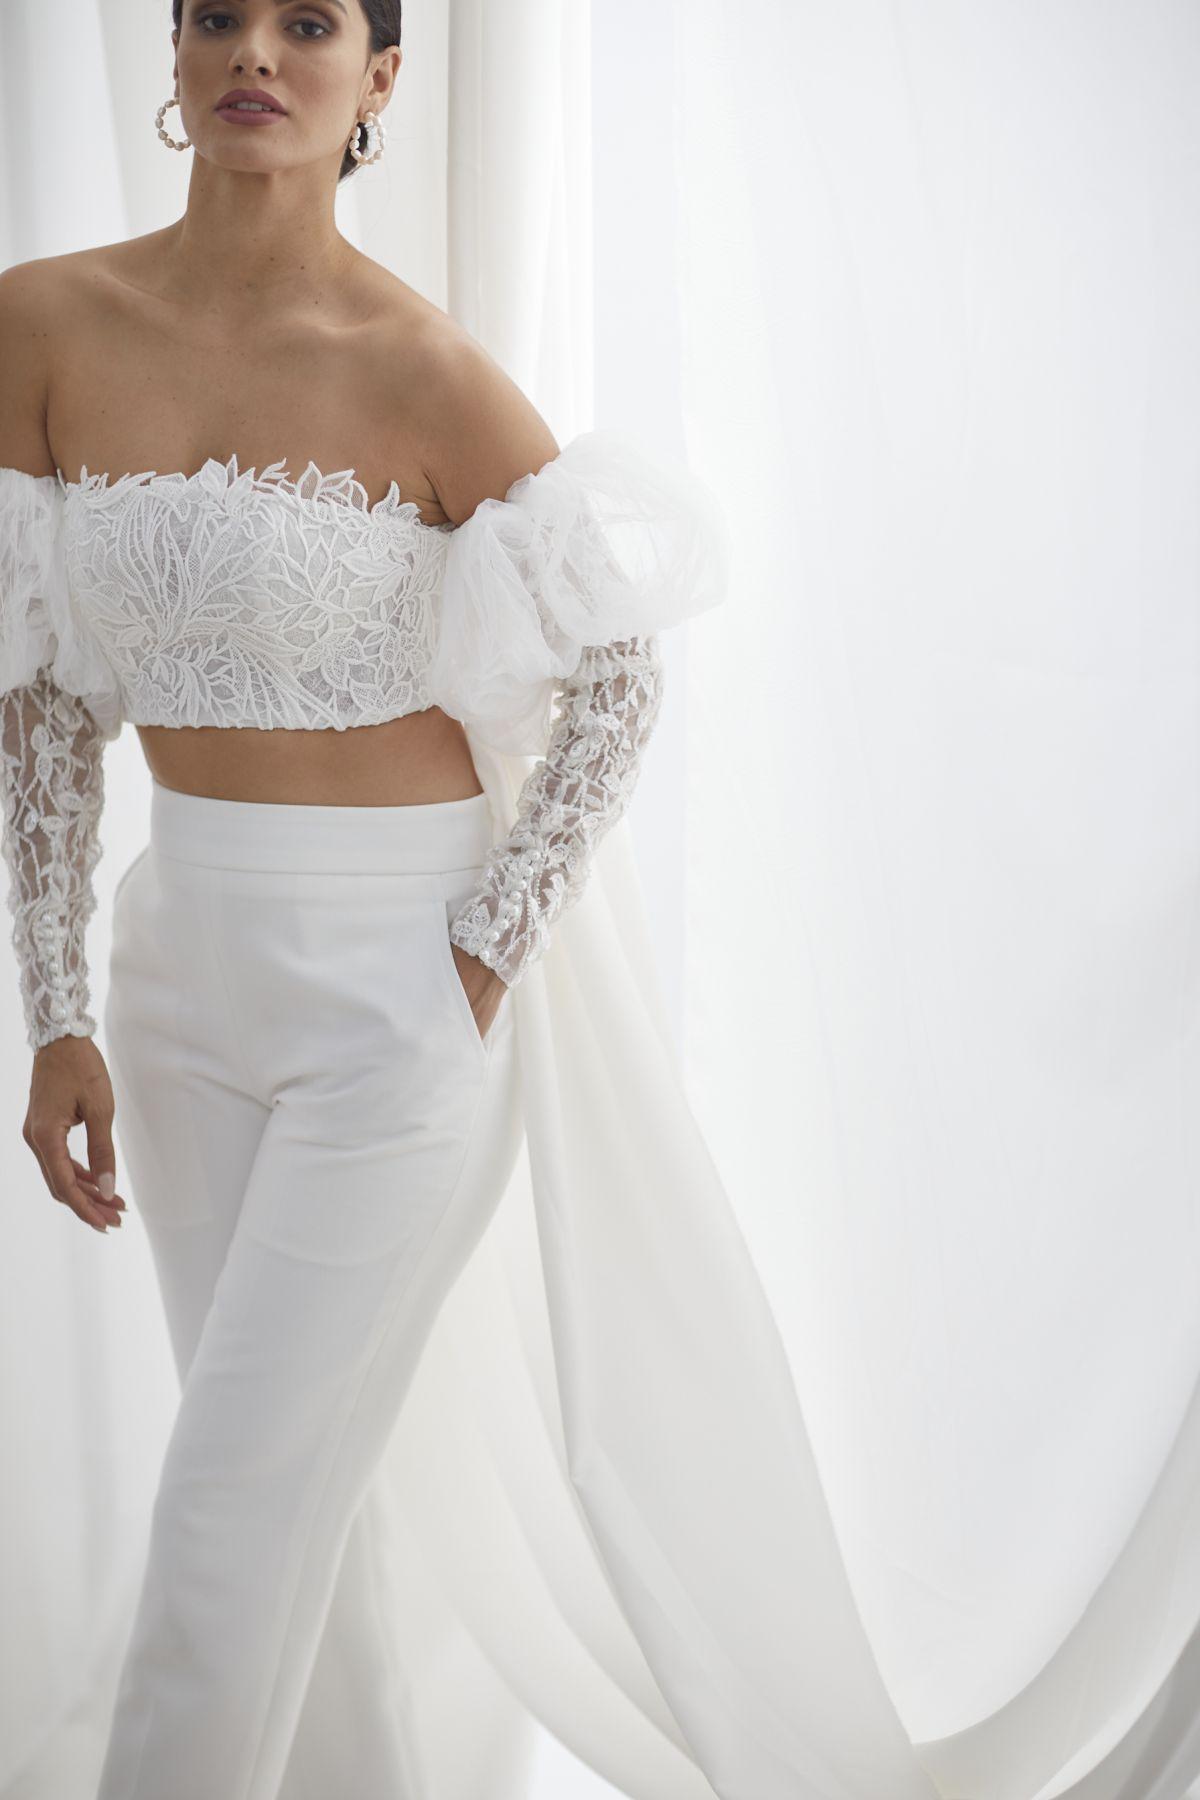 Ada Beaded W Louvre Cigarette Pants Wedding Gown 51_3597